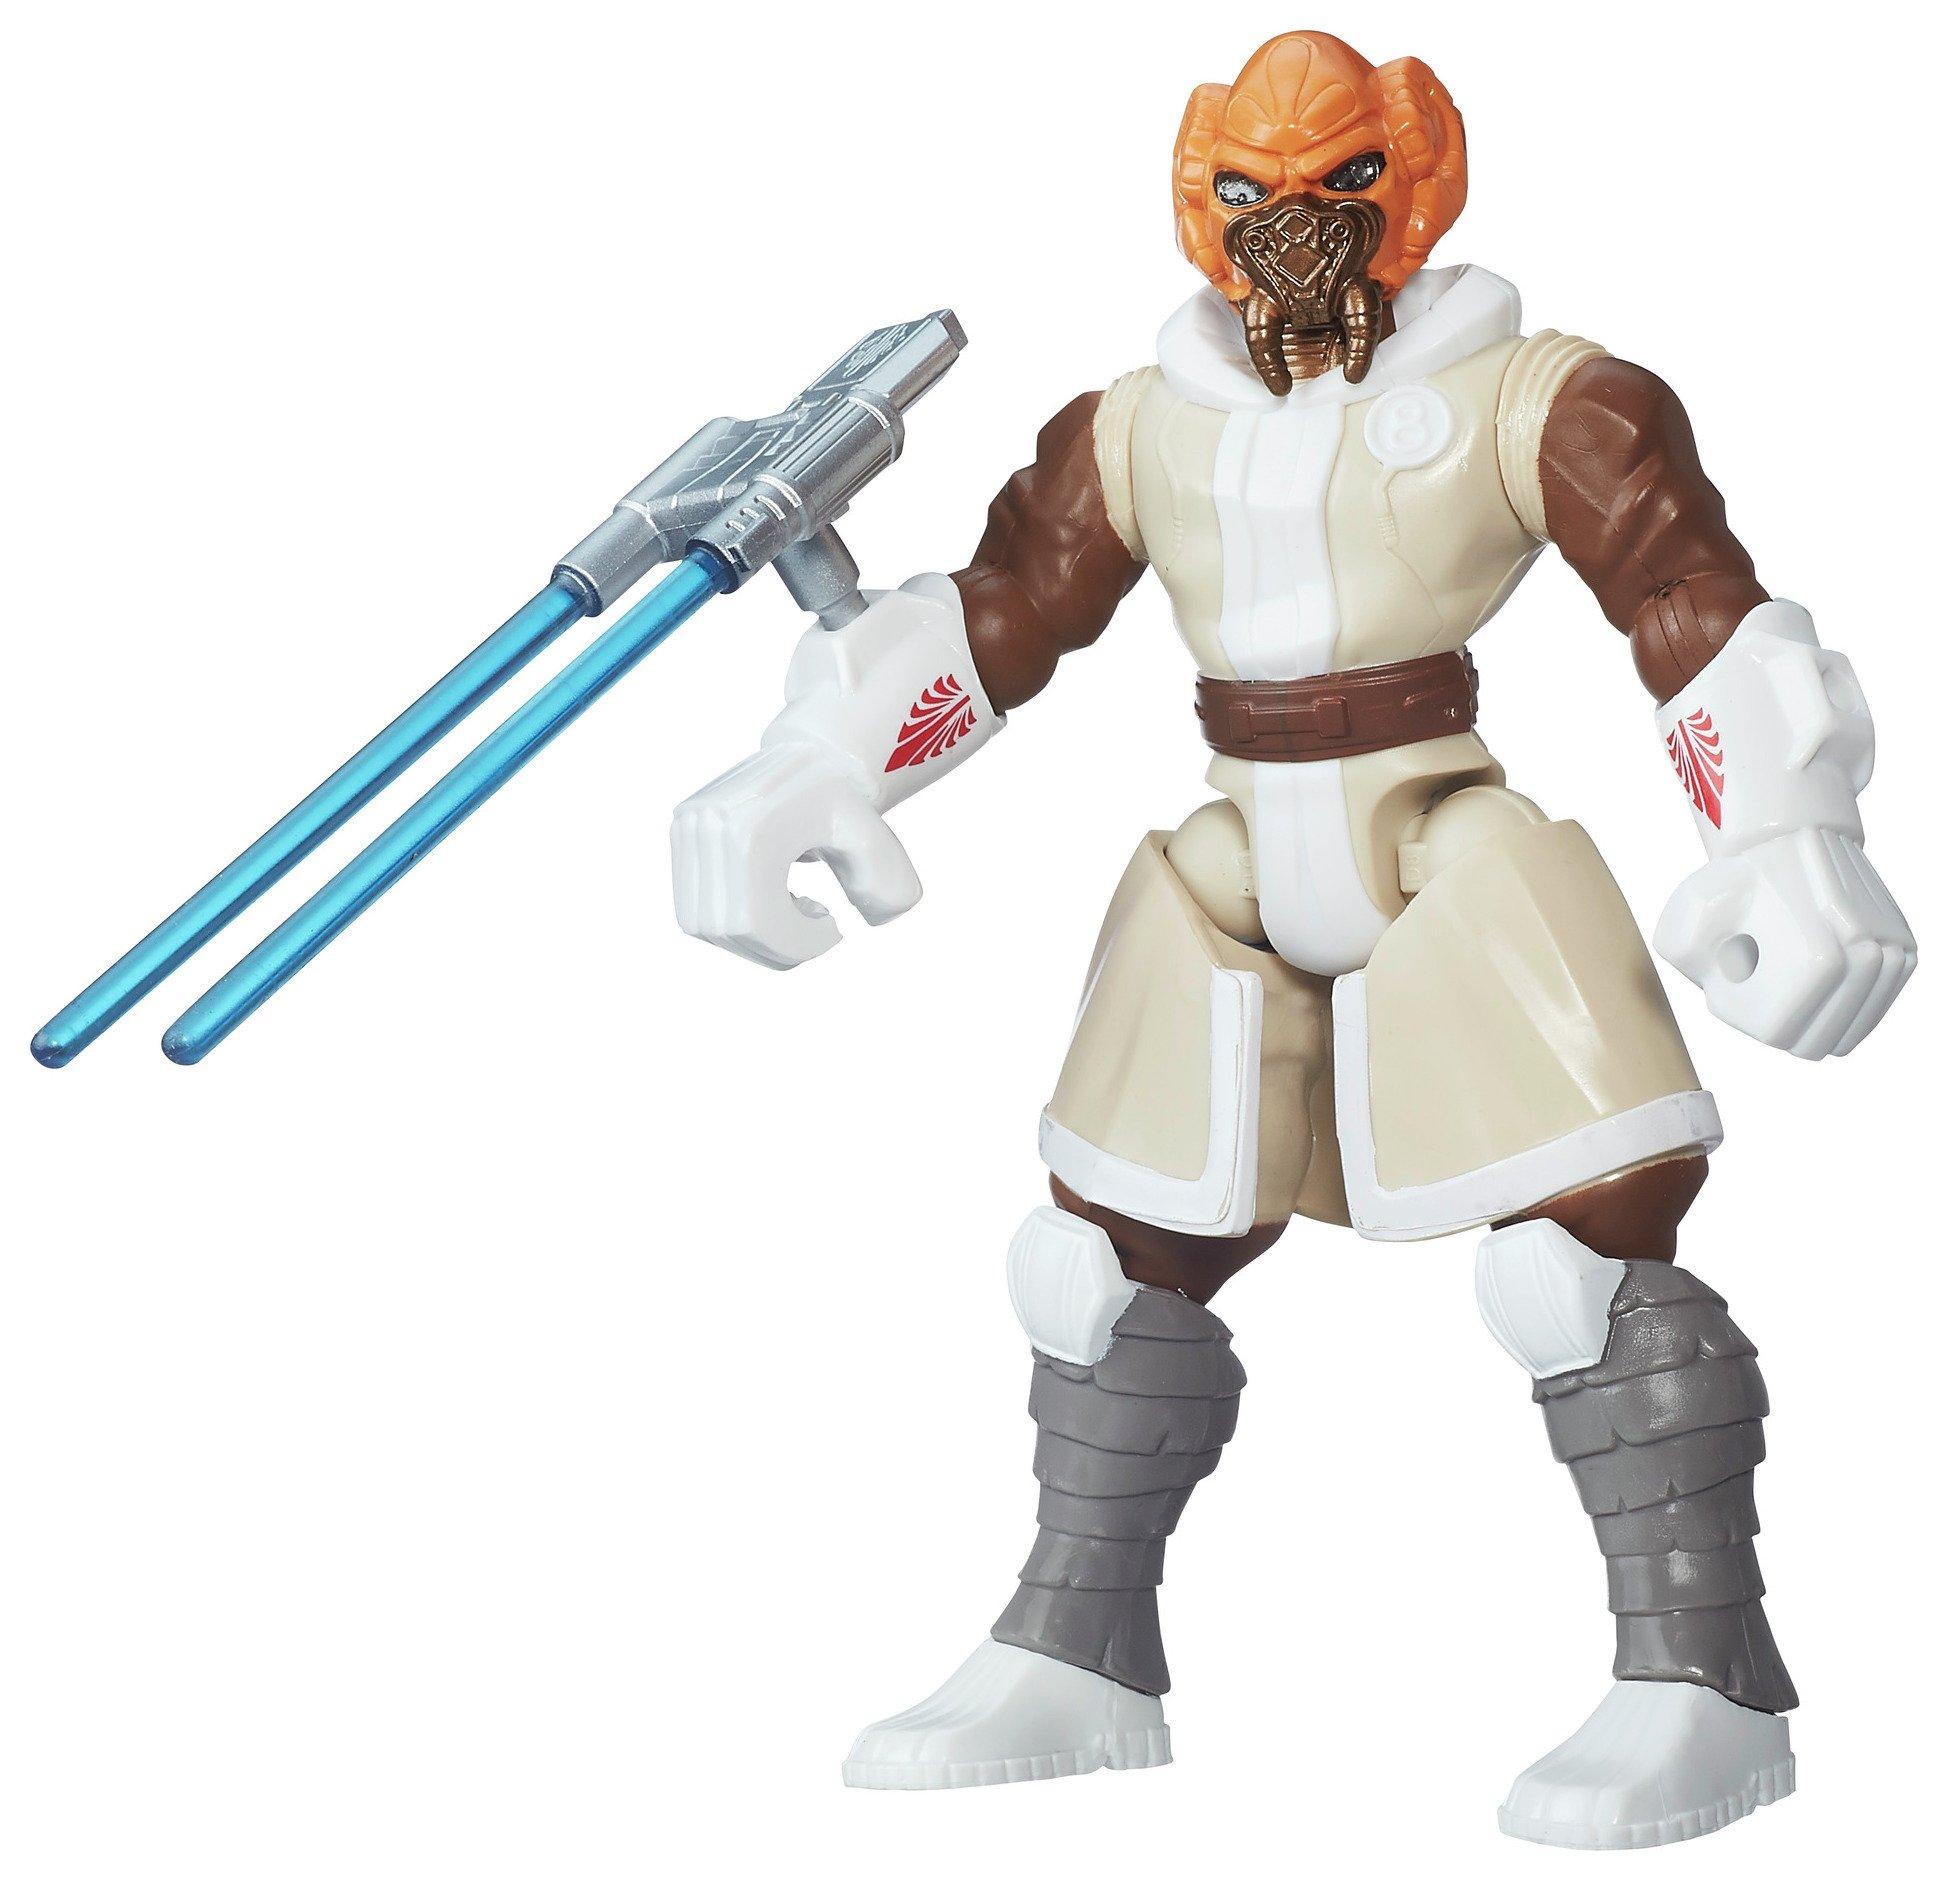 Image of Star Wars The Clone Wars Plo Koon.